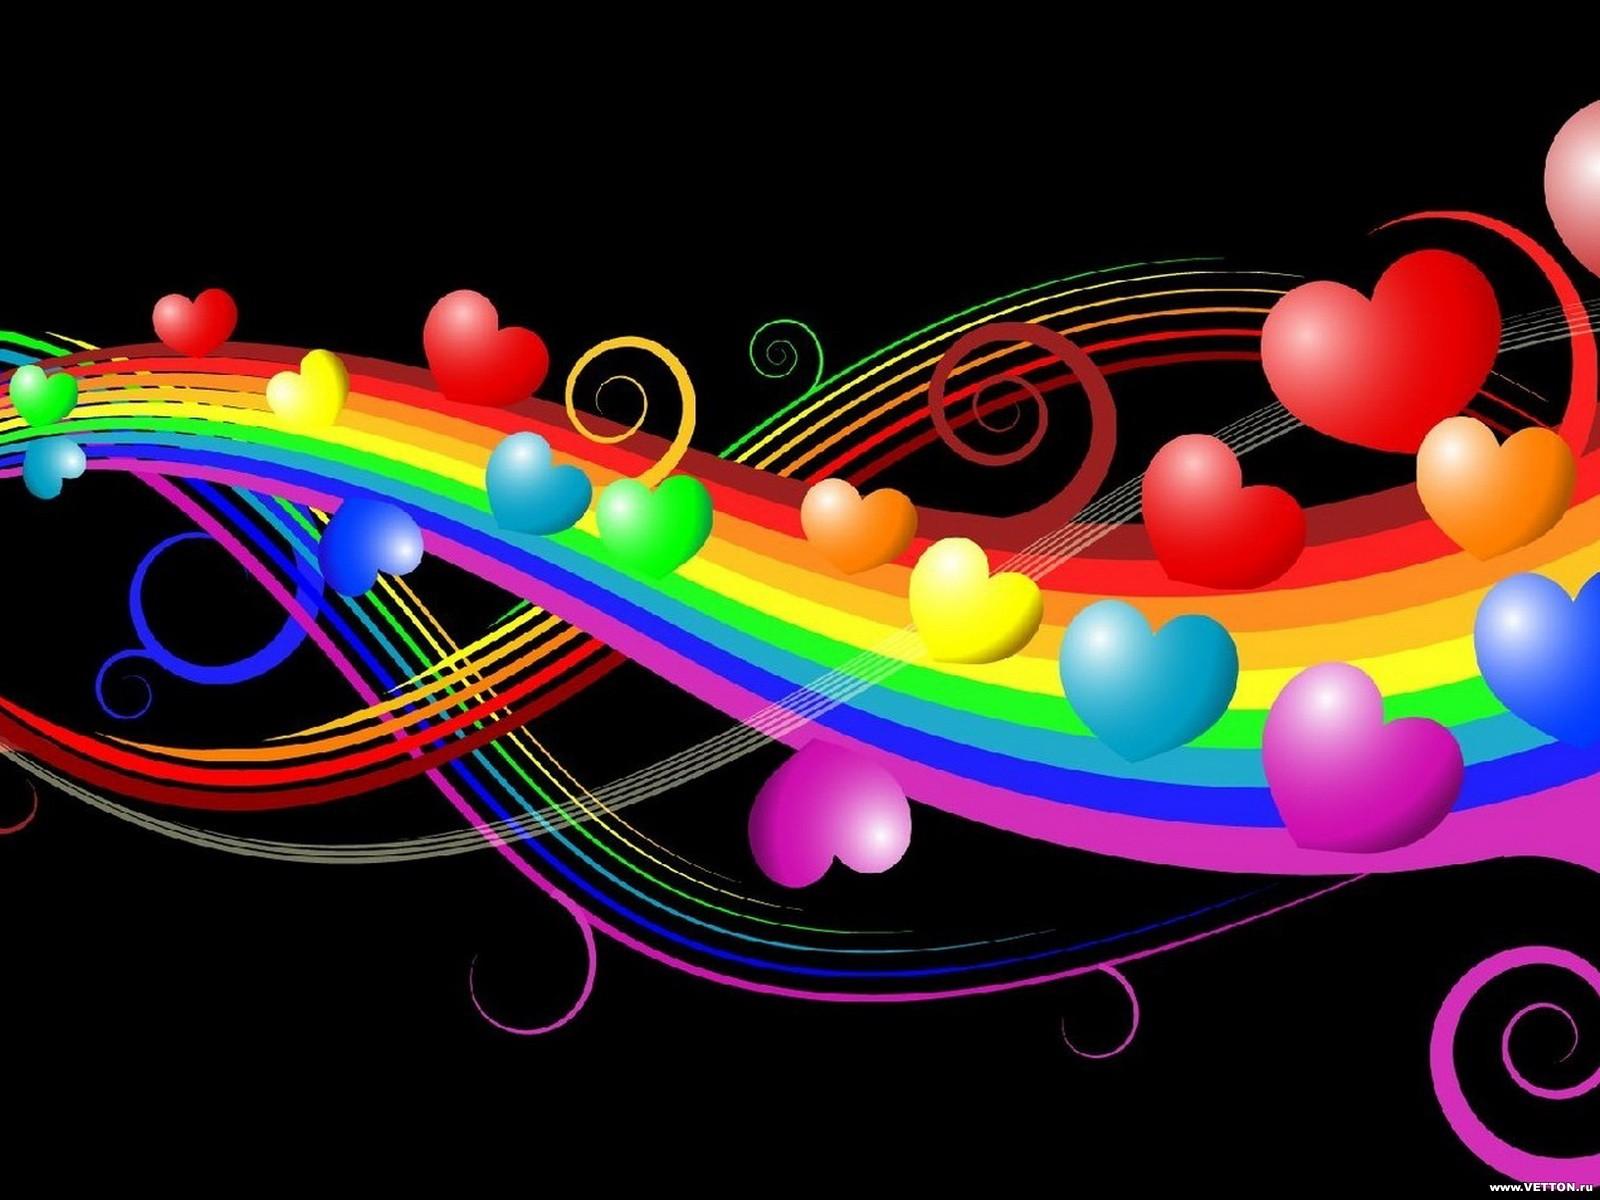 beautiful 3d colorful vivid love bubbles computer background wallpaper 1600x1200